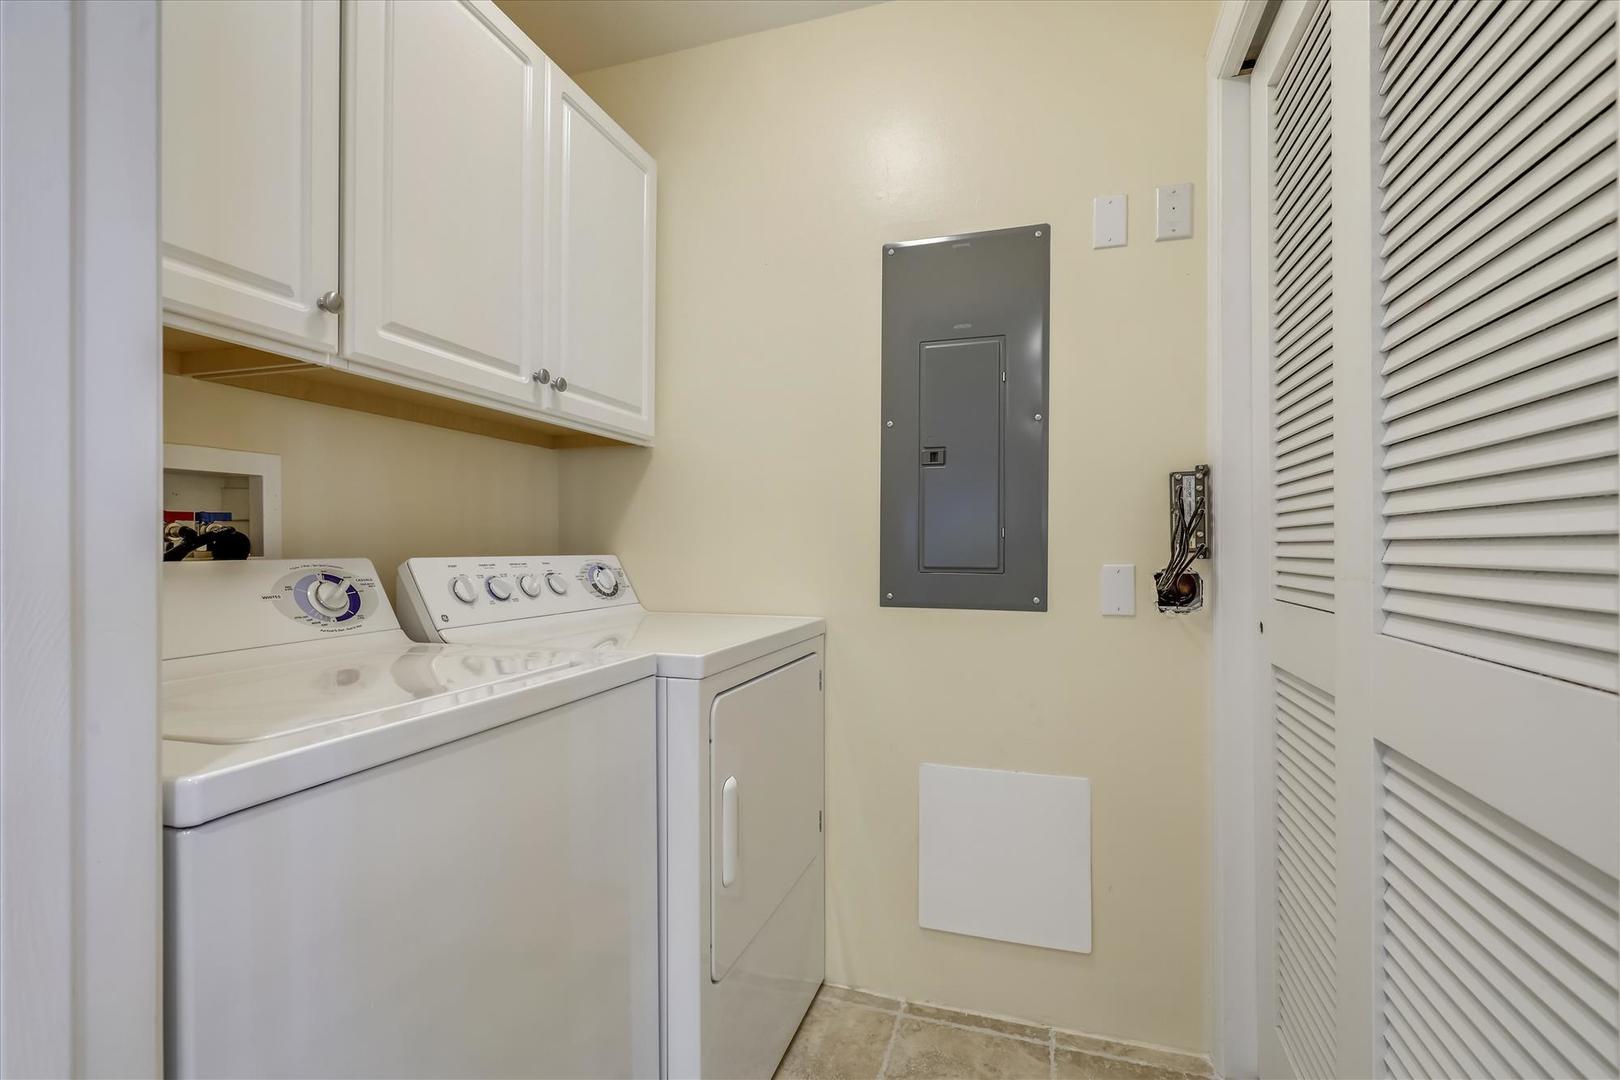 South Beach 304 - Laundry Area